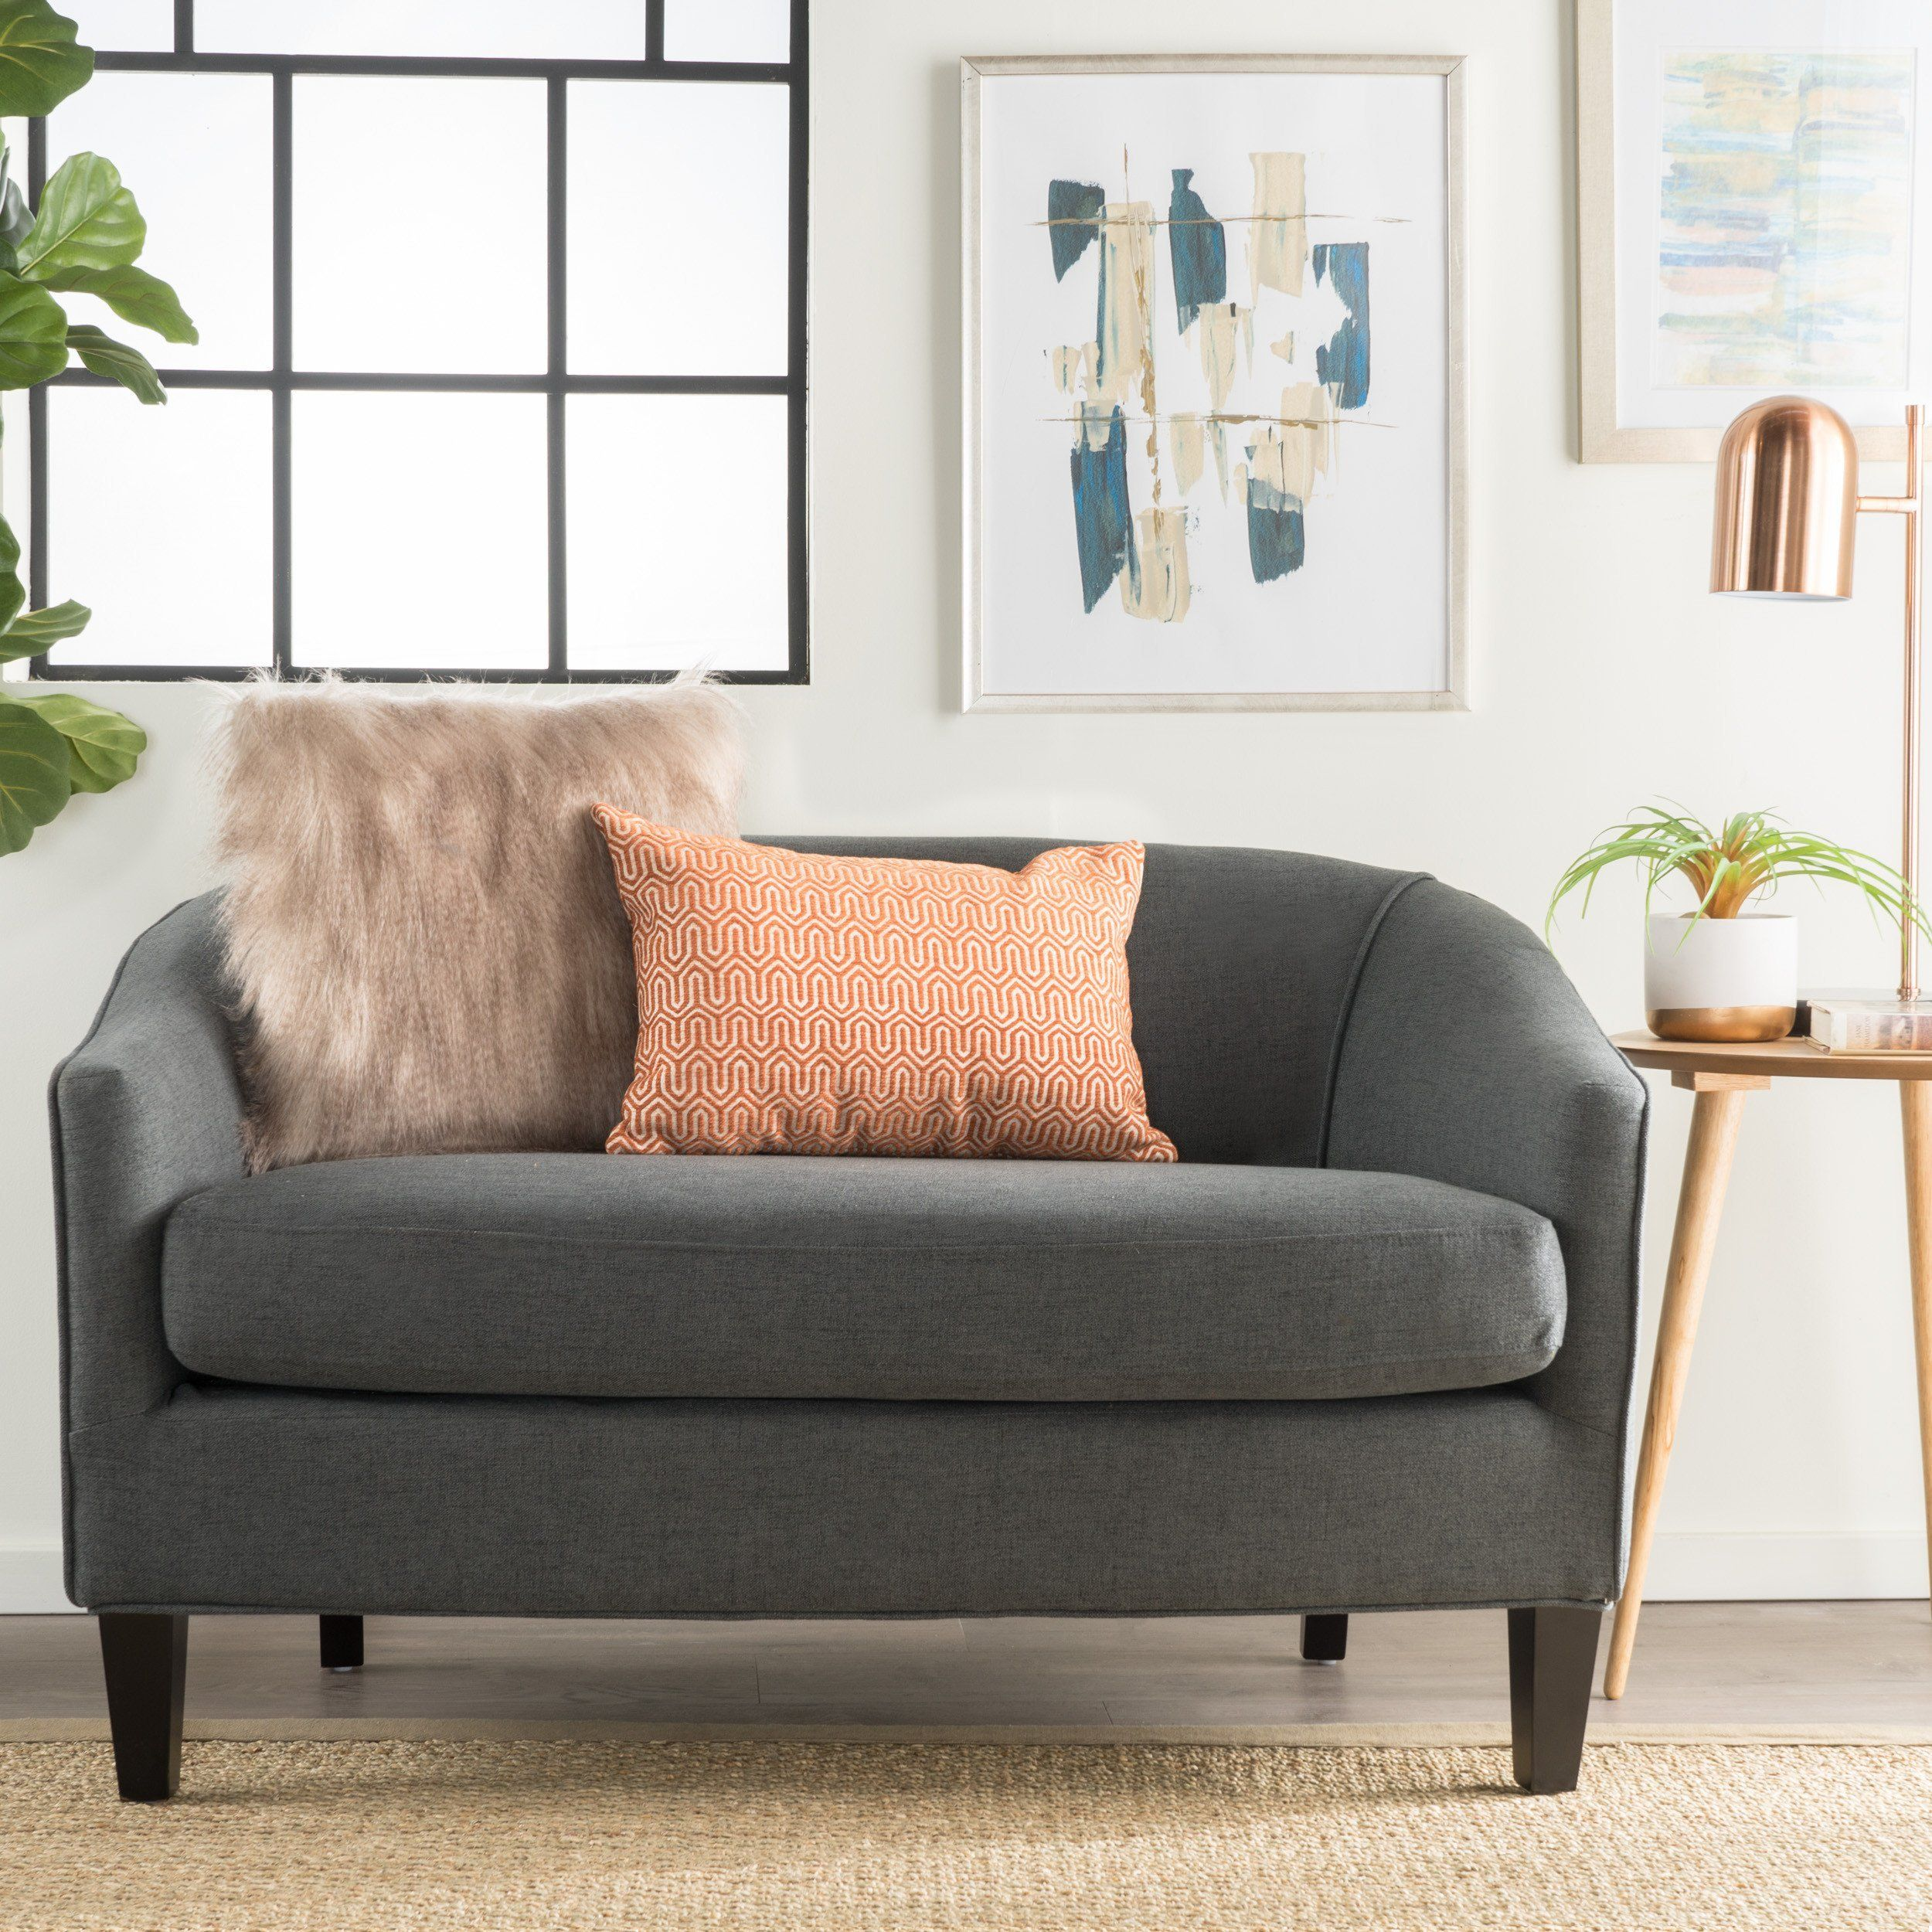 button century dark tufted seater mid harper modern walnut petite studio upholstered loveseat fabric grey ls baxton wood